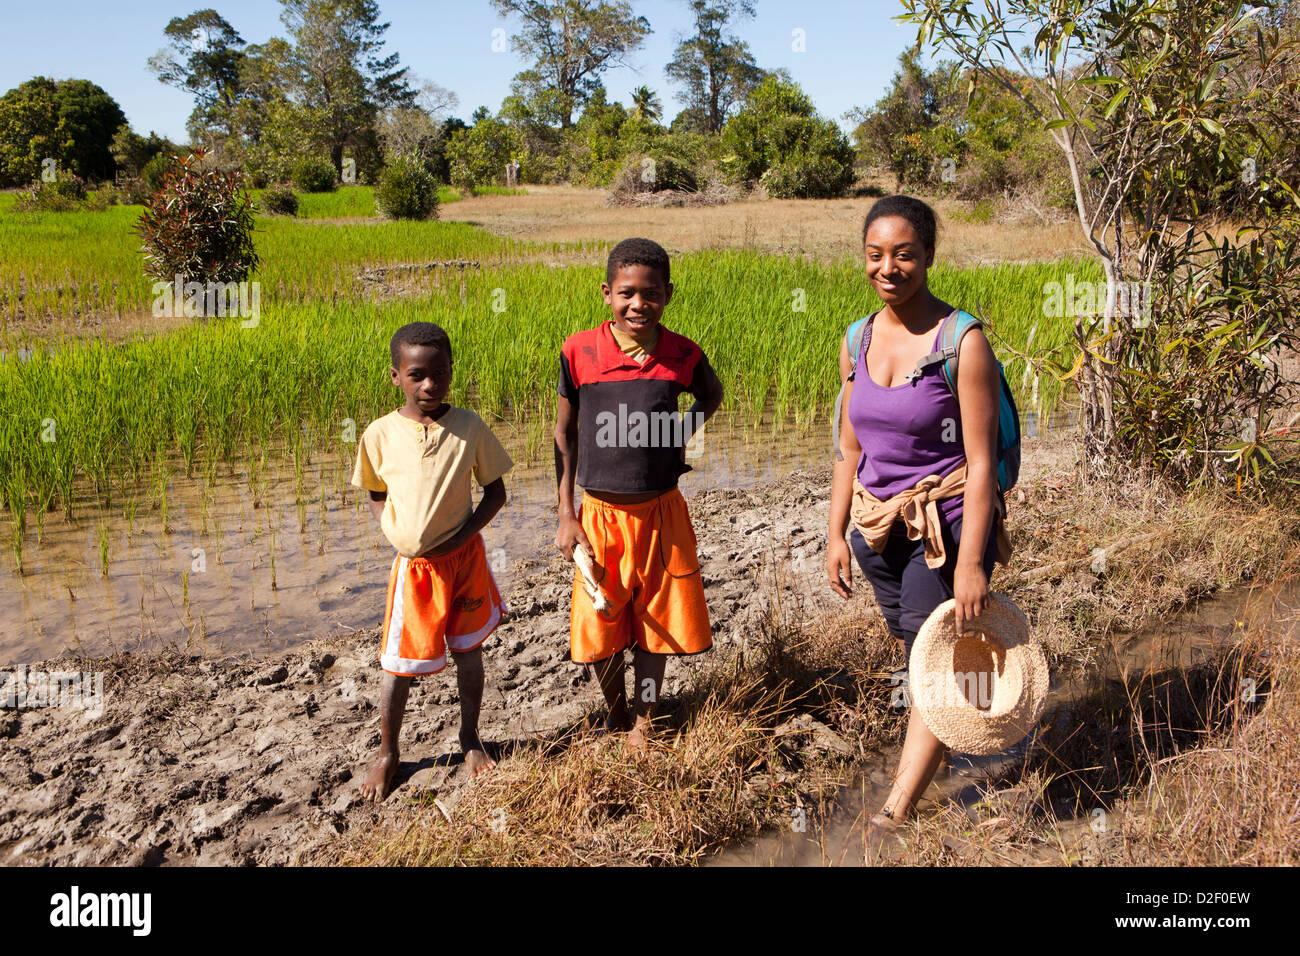 Madagascar, Operation Wallacea, Matsedroy, sixth form student with Madagascan boys - Stock Image